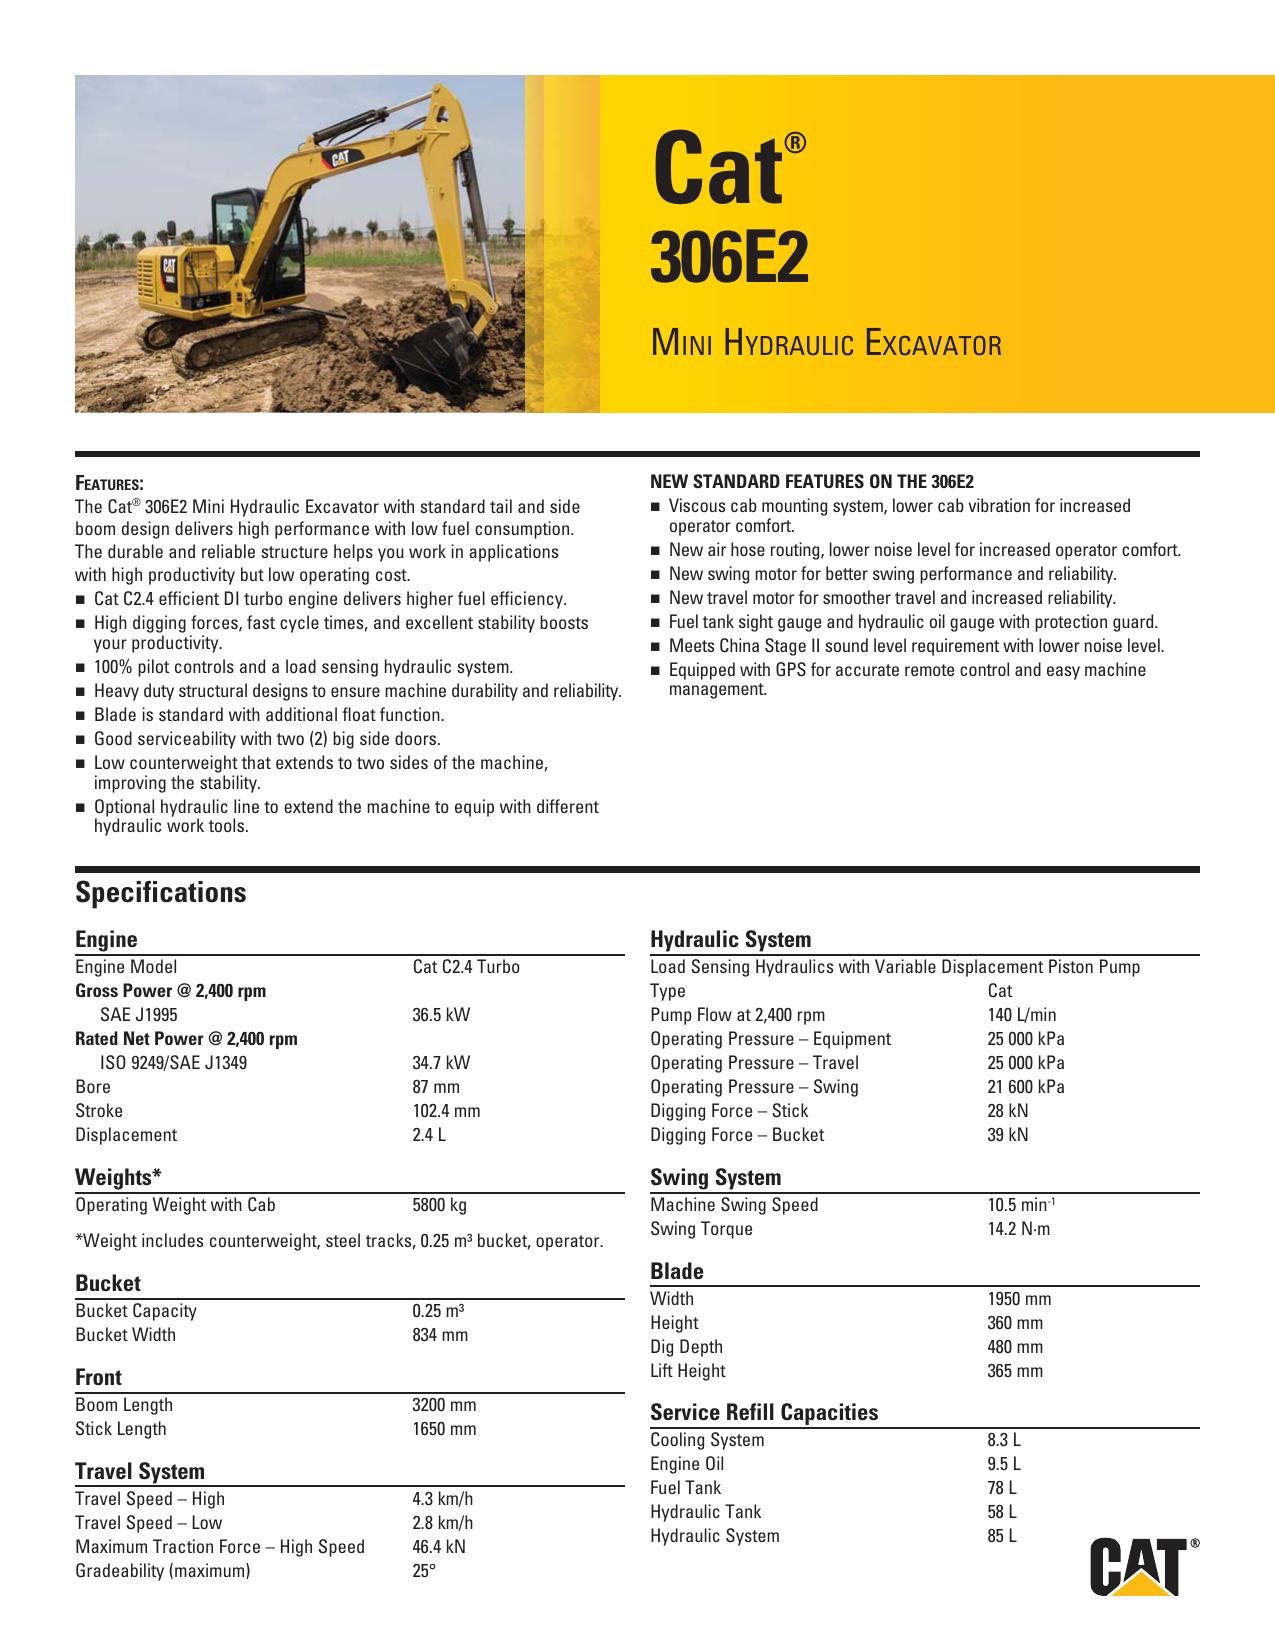 Small Specalog for Cat 306E2 Mini Hydraulic Excavator